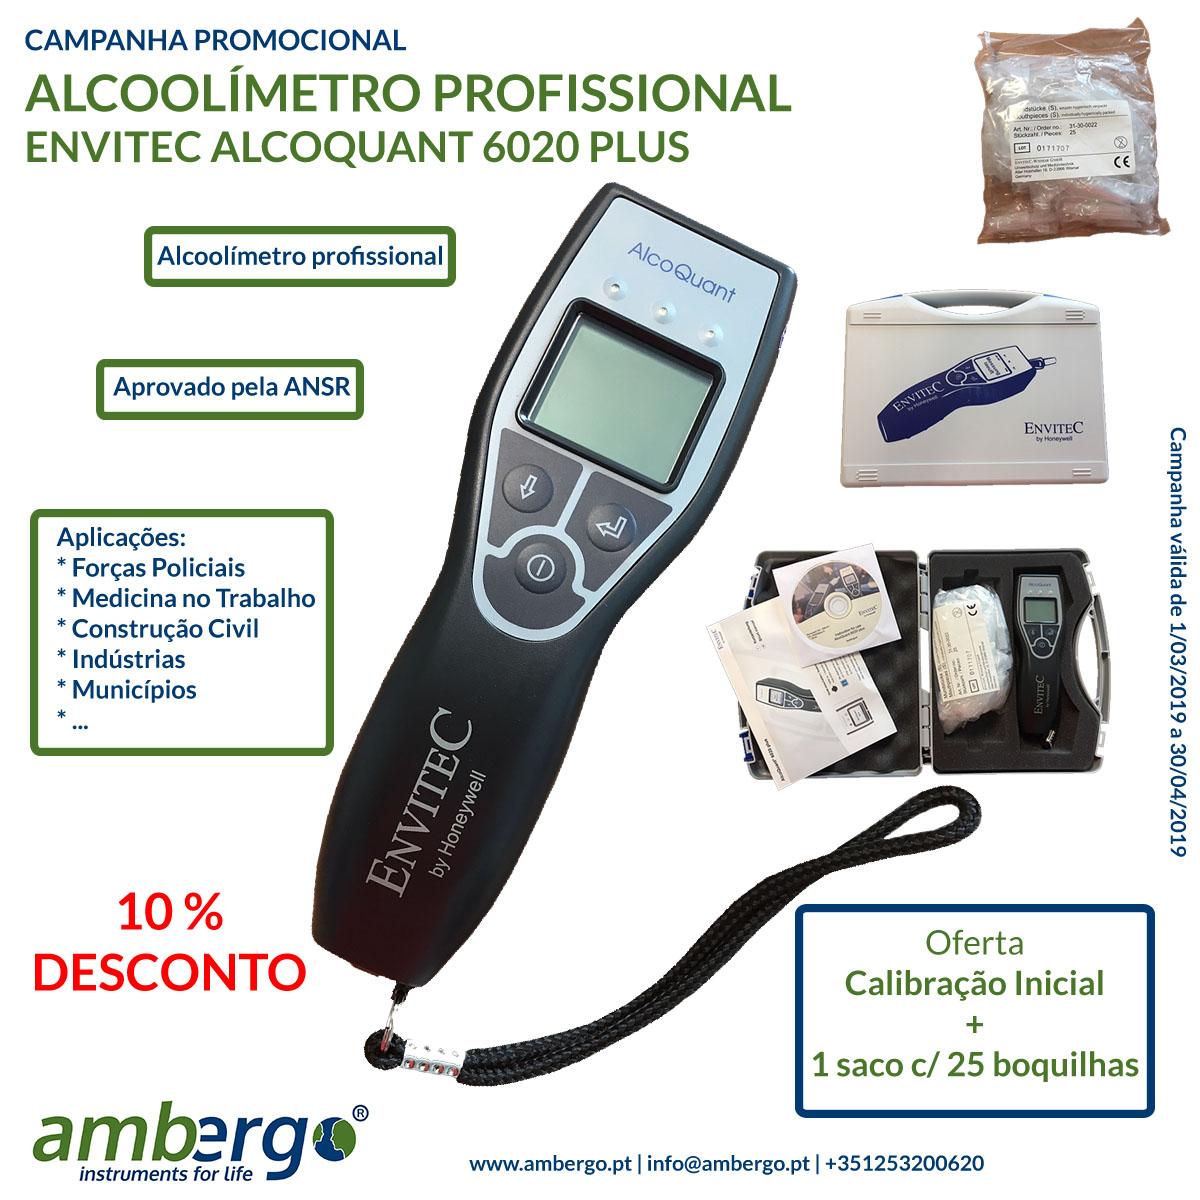 Campanha Promocional – ALCOOLÍMETRO PROFISSIONAL